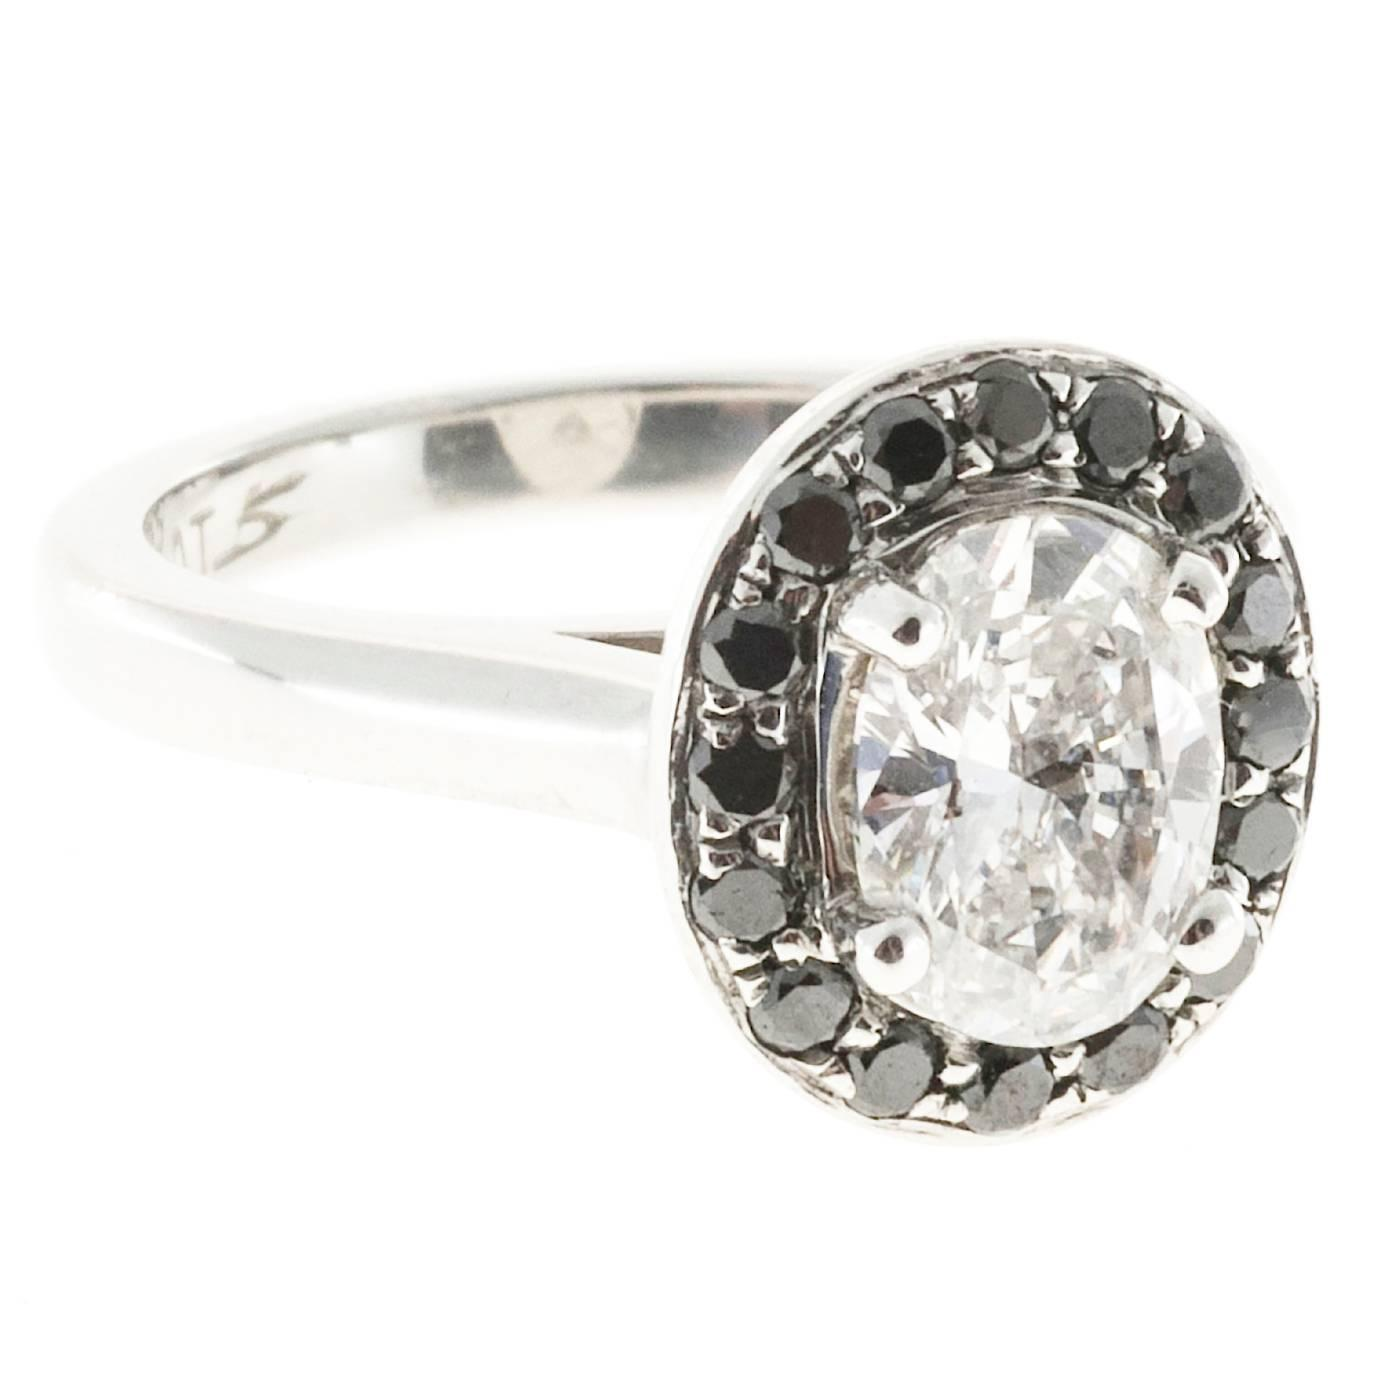 Oval Diamond And Black Diamond Halo Platinum Ring For Sale at 1stdibs